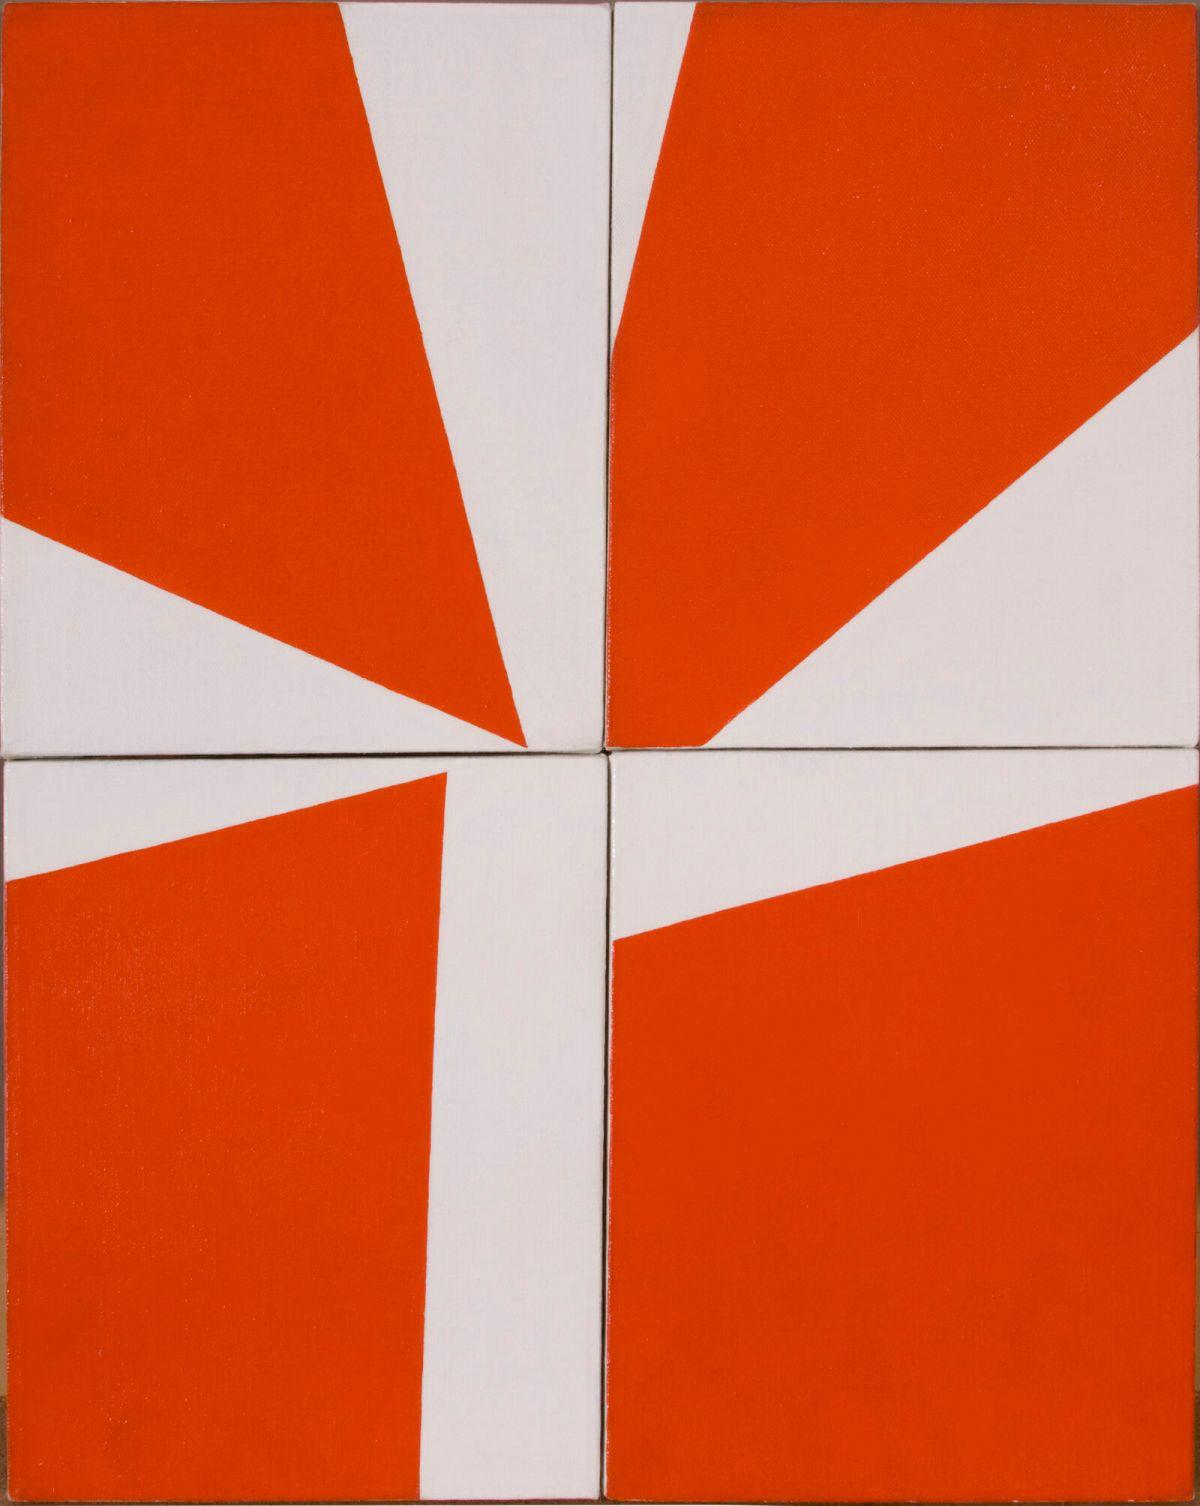 Ralph Coburn, Orange and White Abstracon, 1950